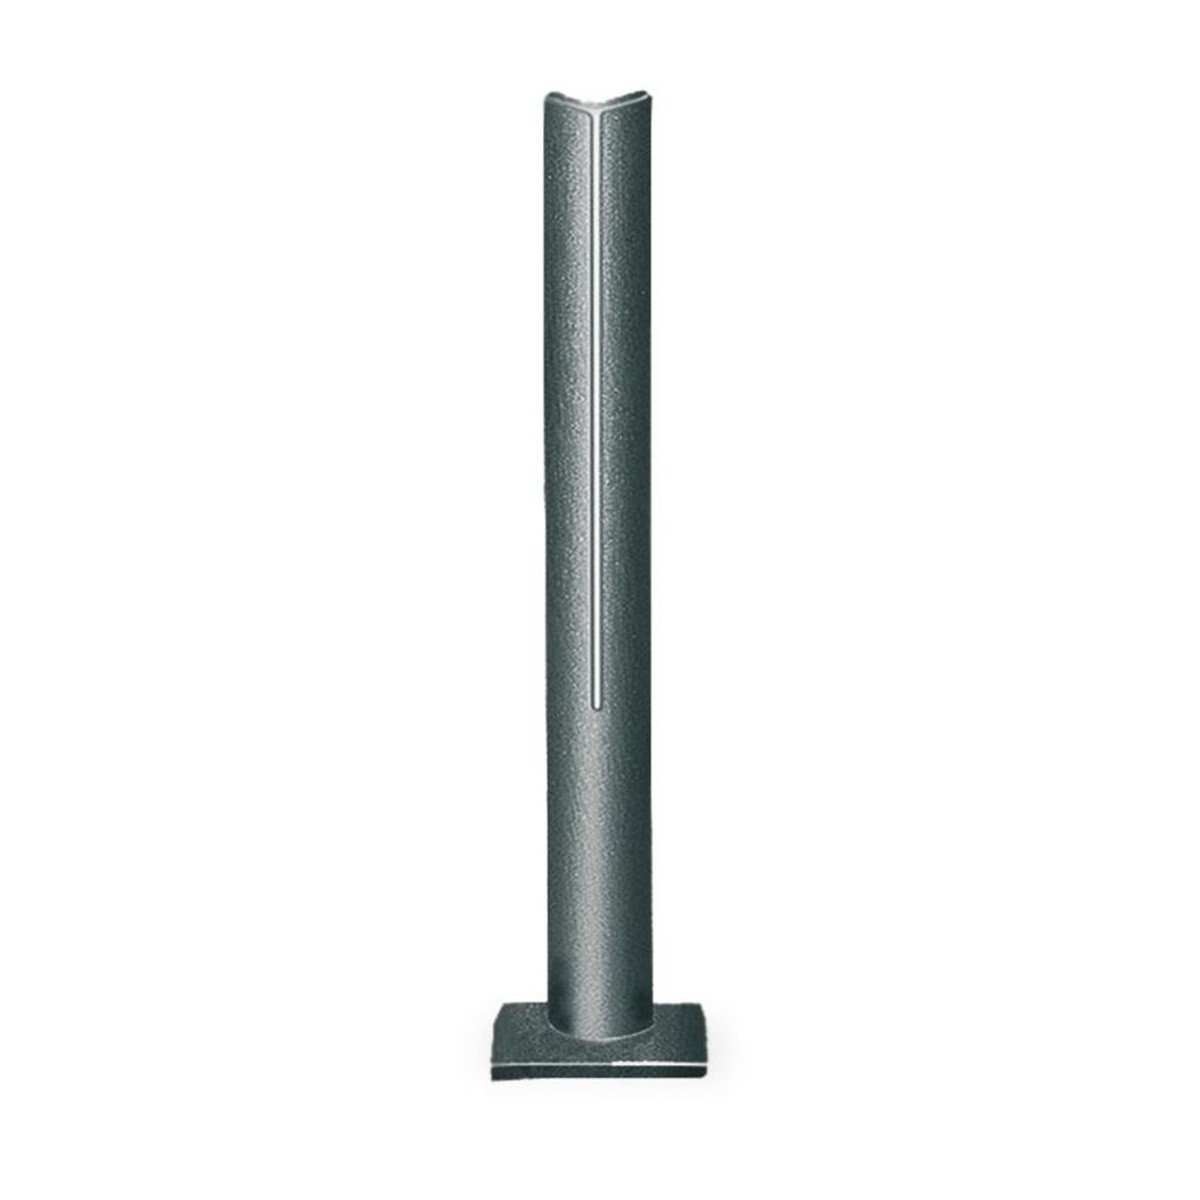 Pilona tipo Badalona grande para atornillar de 200 Ø - C-45G